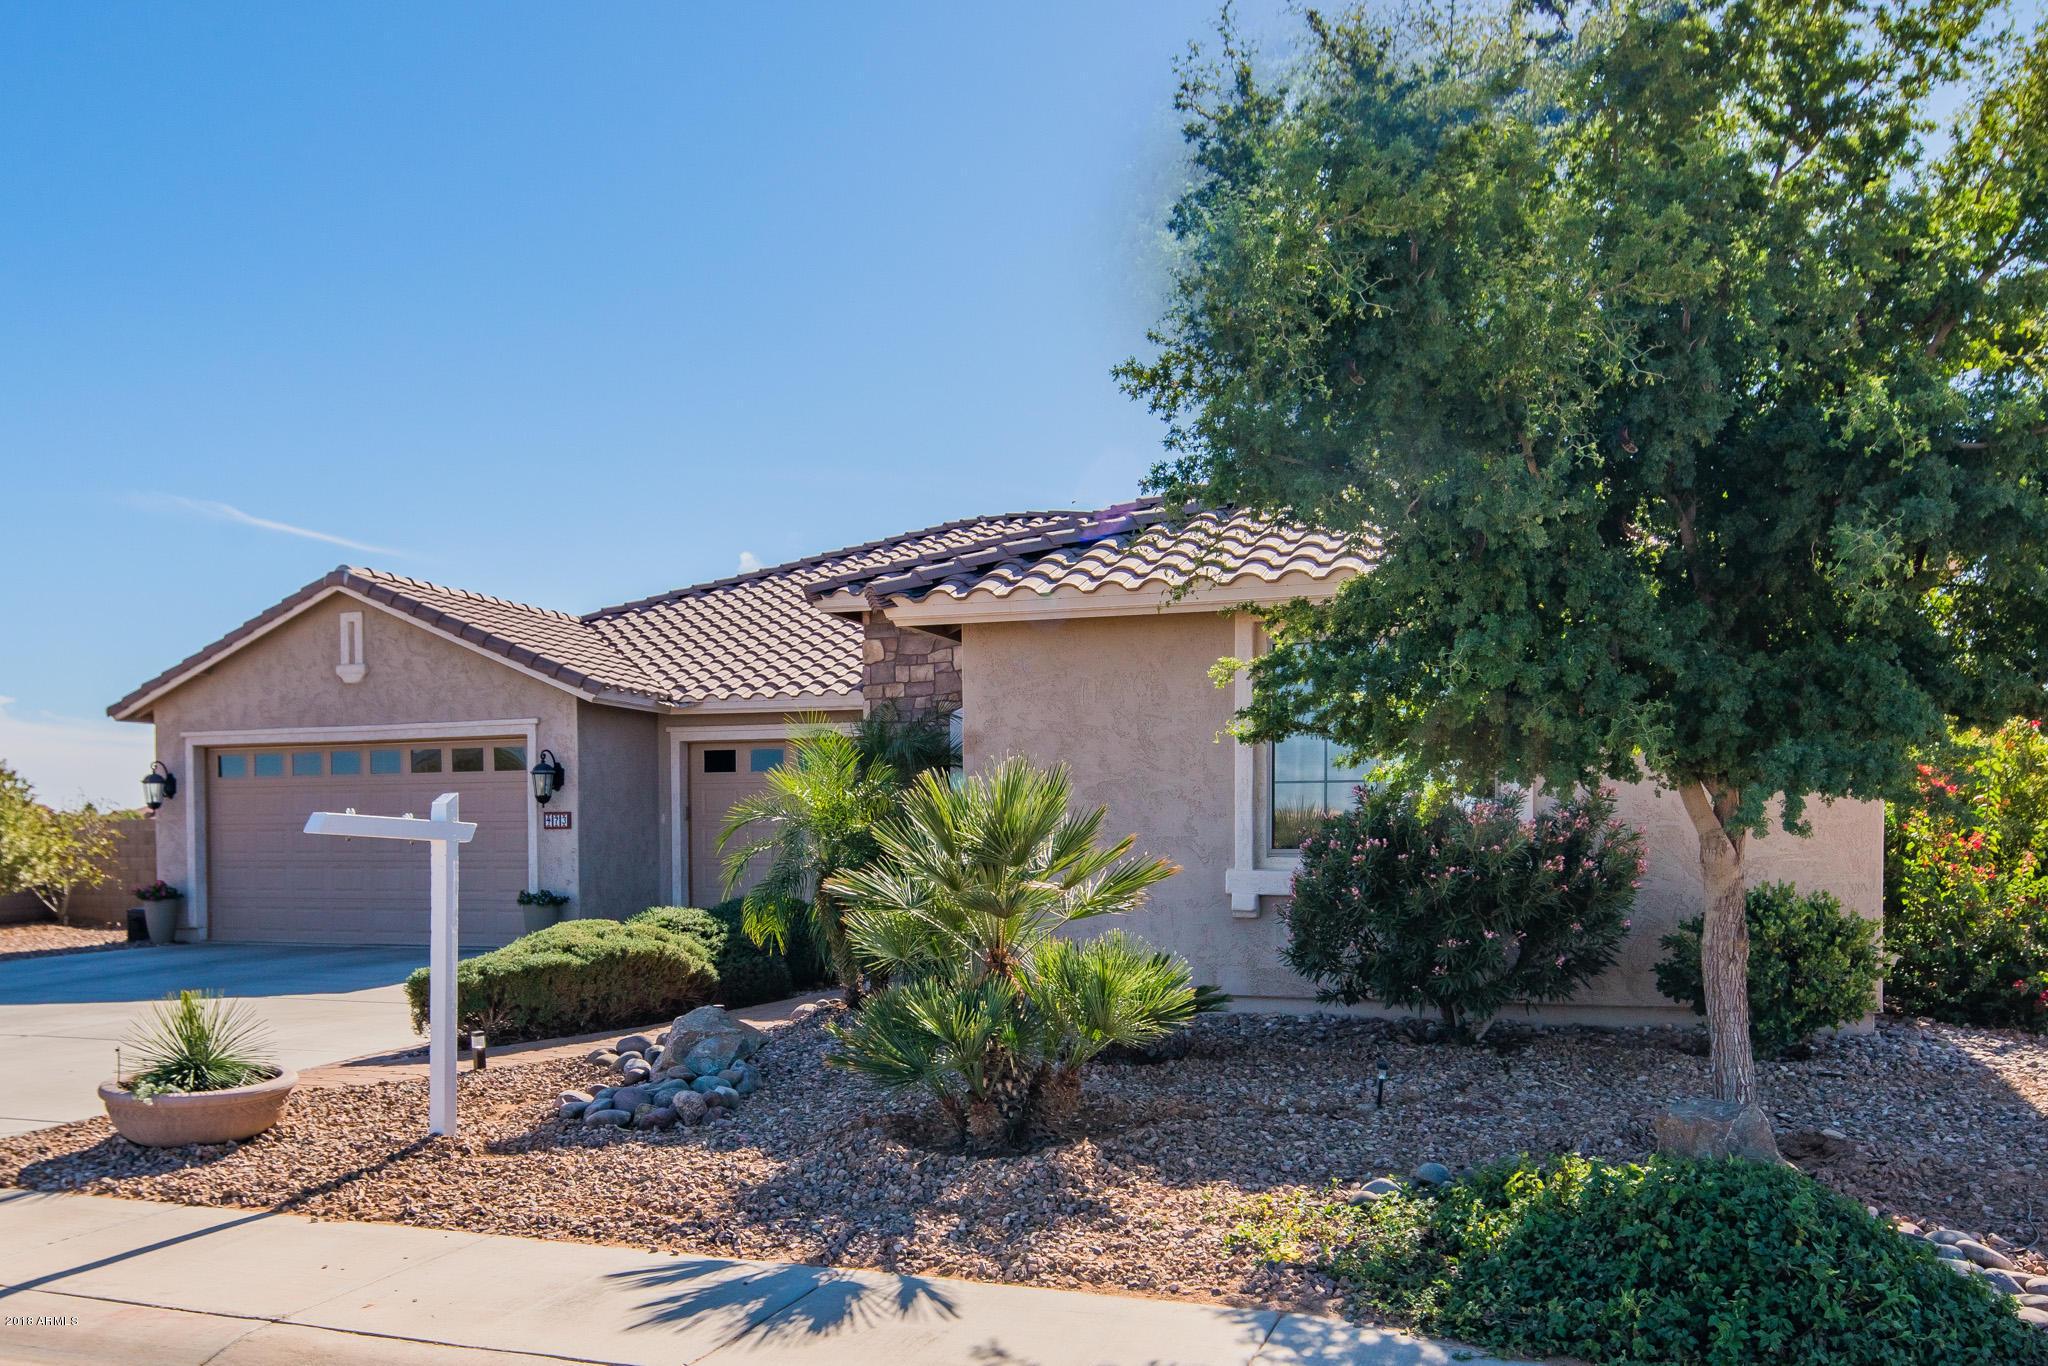 MLS 5834607 473 E SHELLIE Court, Casa Grande, AZ 85122 Casa Grande AZ McCartney Ranch